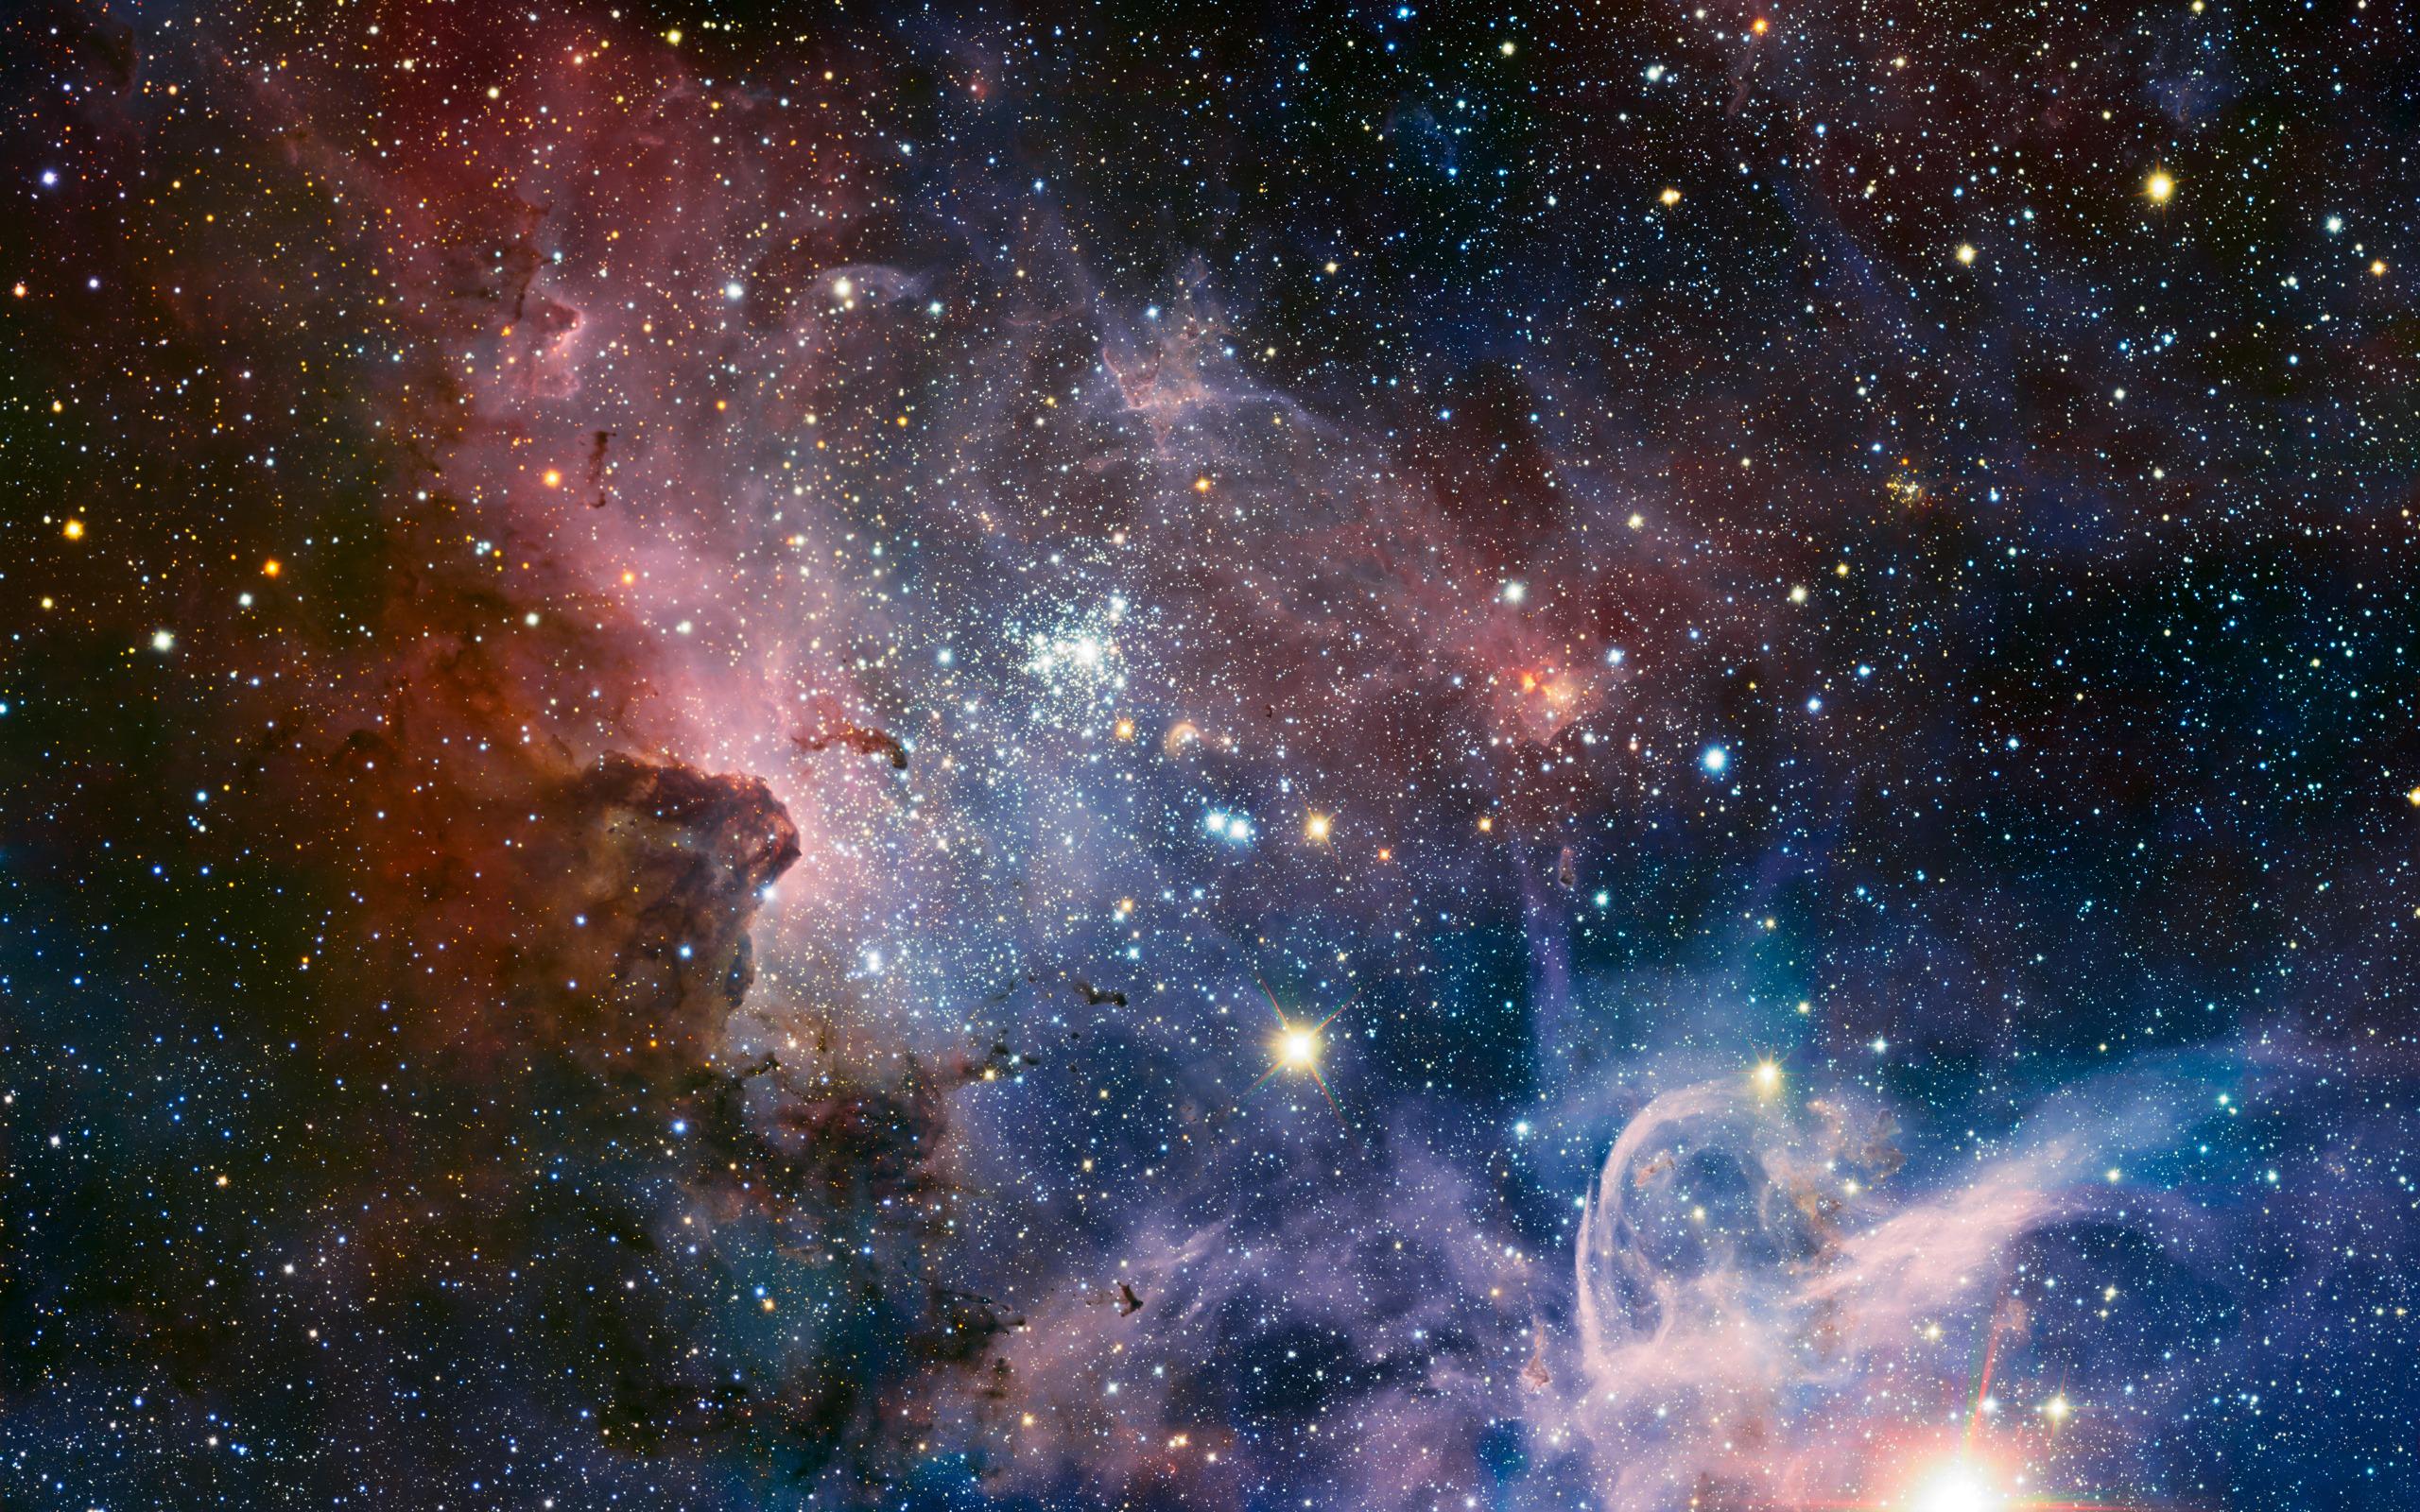 Nebula Wallpaper 860564 Nebula Wallpaper 860617 Nebula Wallpaper 2560x1600